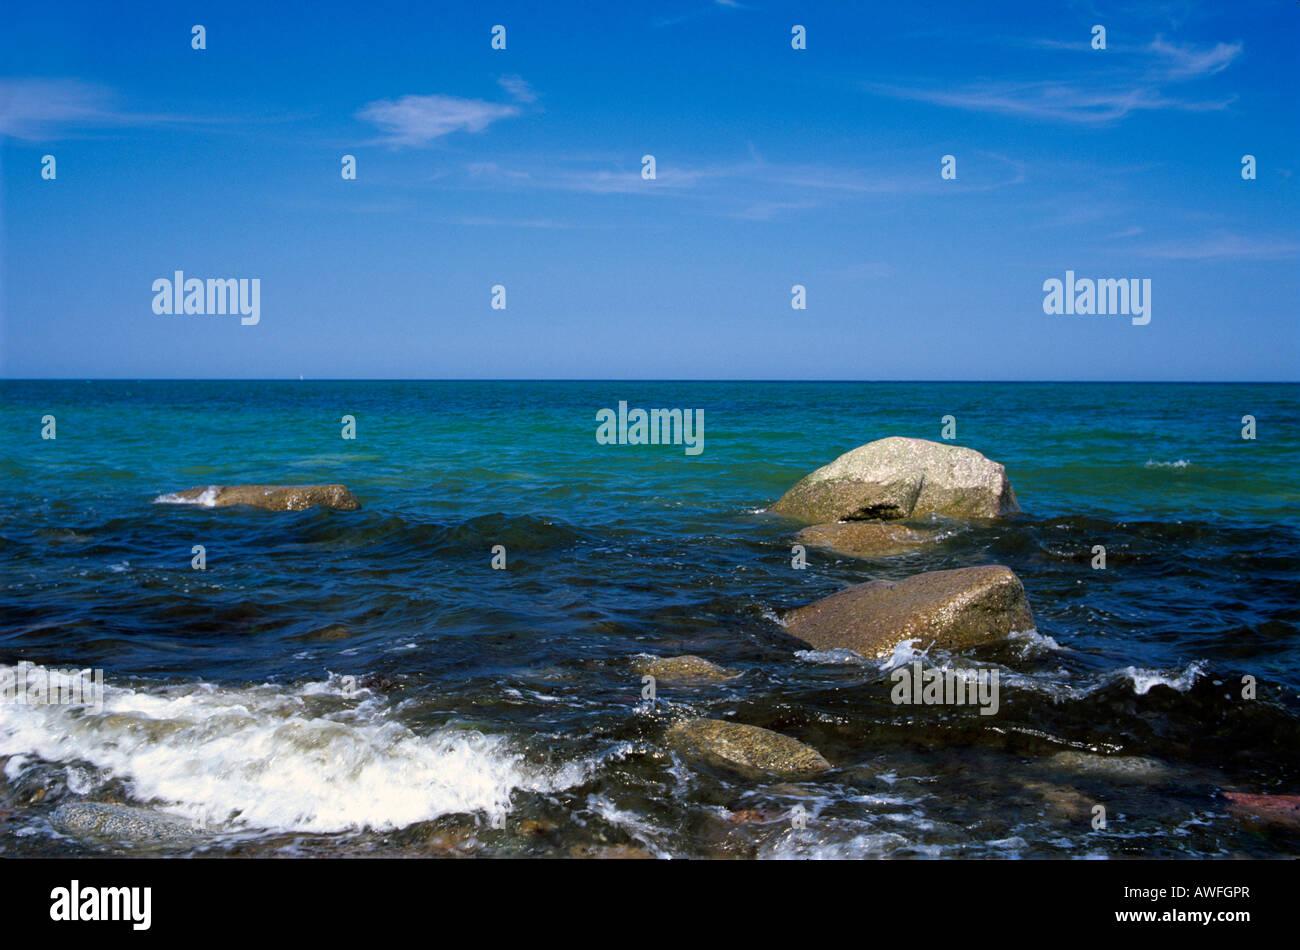 Rocks in the surf, Baltic Sea, Ruegen Island, Mecklenburg-Western Pomerania, Germany, Europe - Stock Image